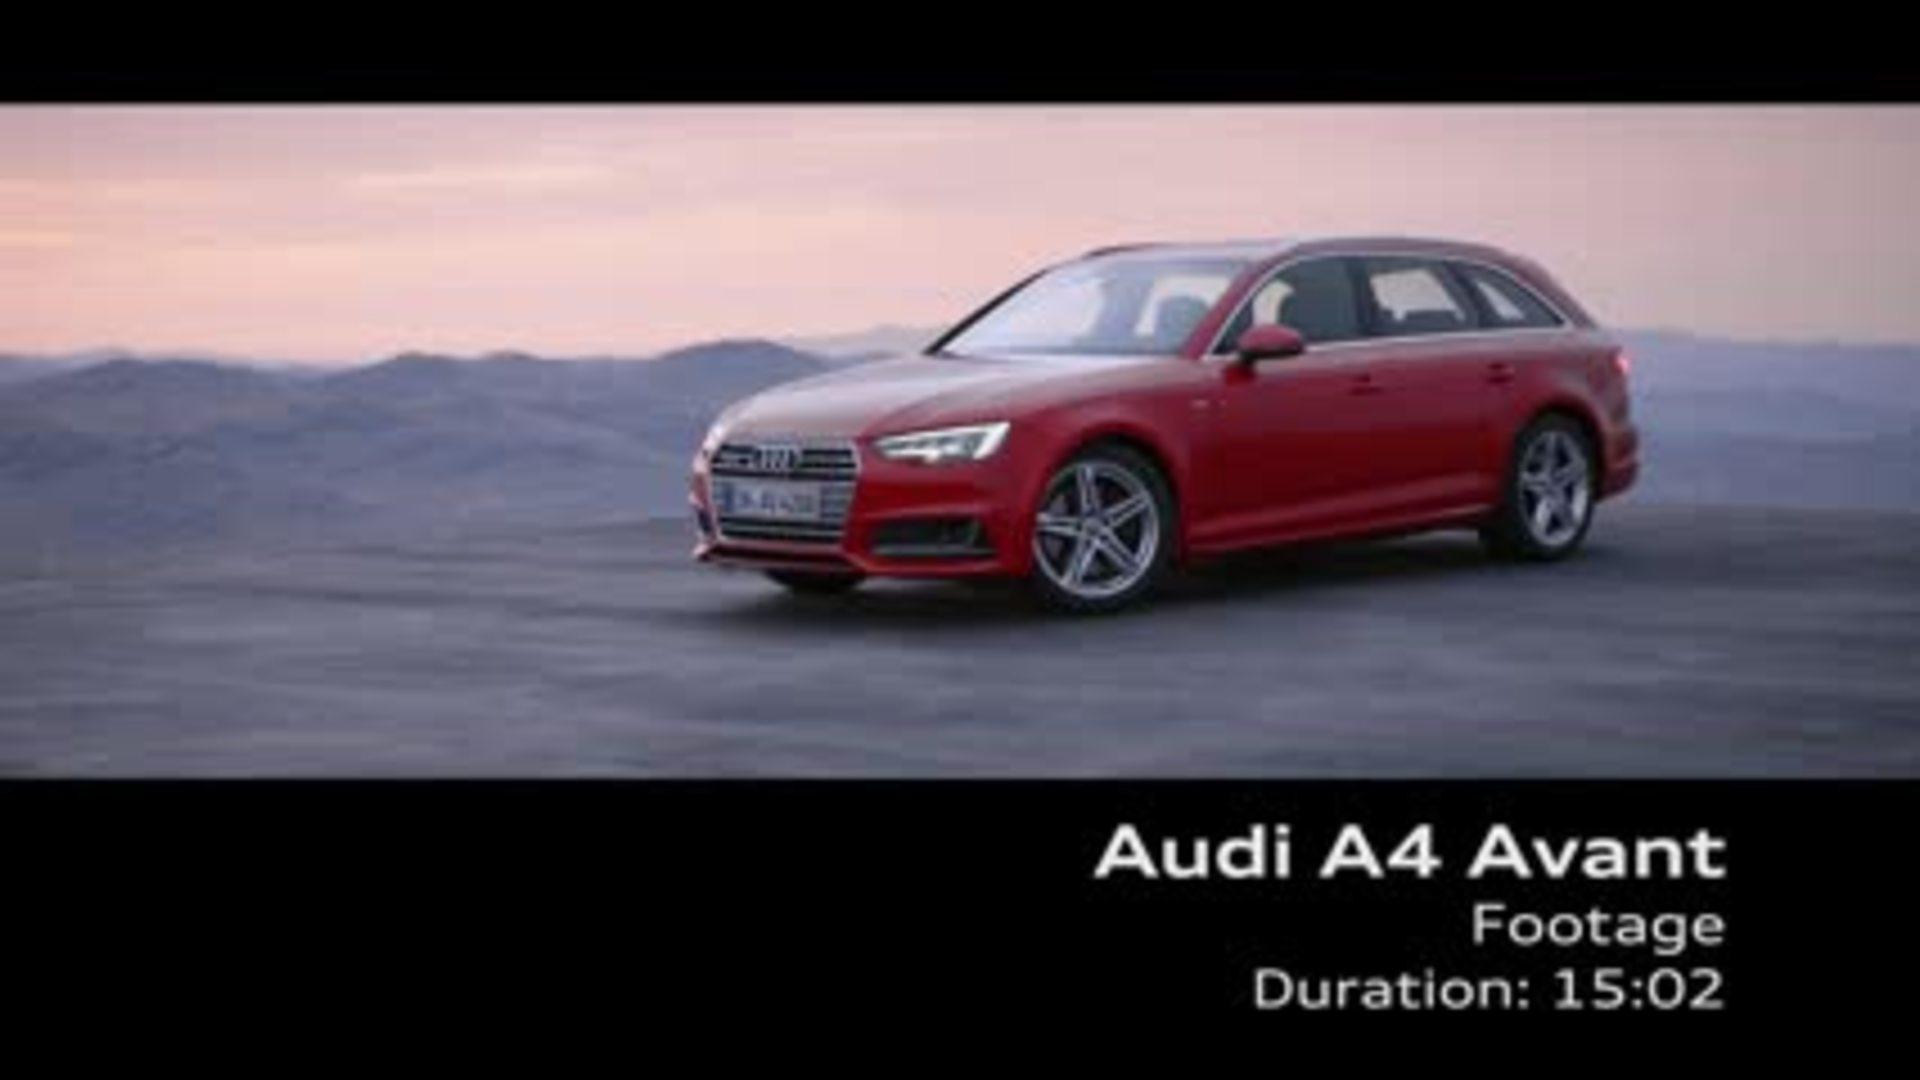 Der neue Audi A4 Avant (2015) - Footage